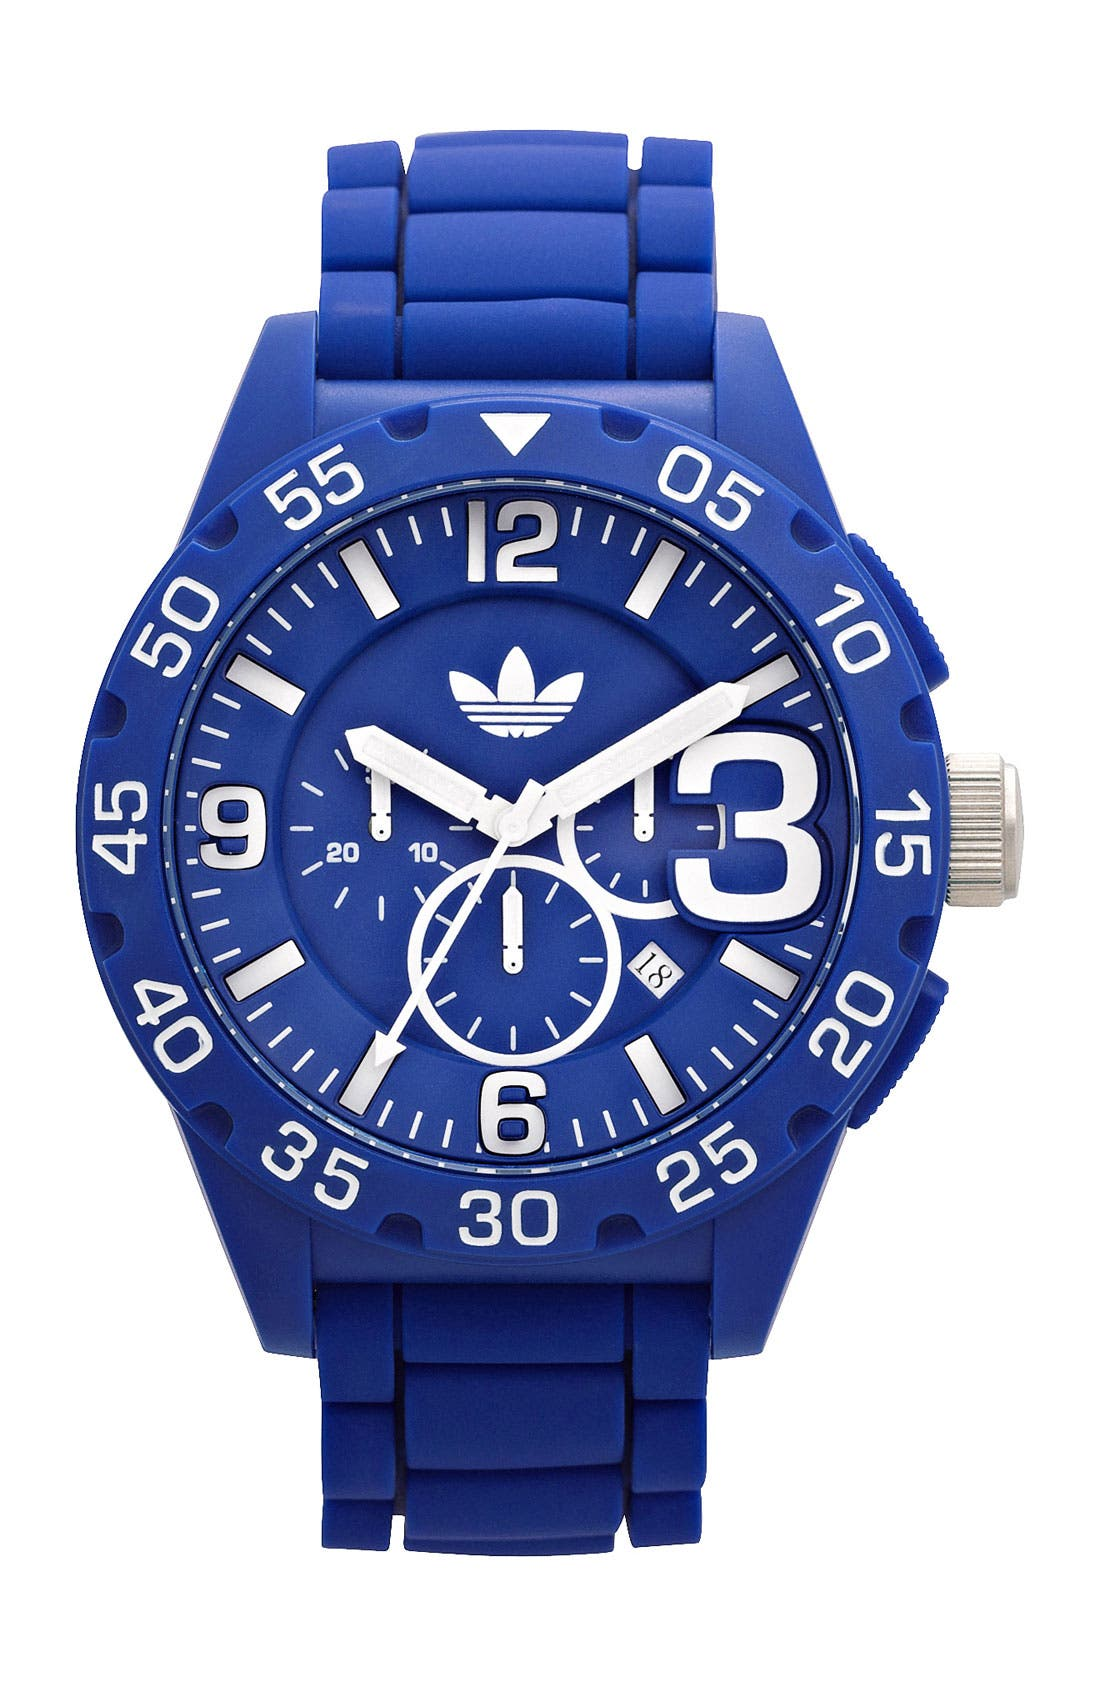 Alternate Image 1 Selected - adidas Originals 'Newburgh' Chronograph Watch, 48mm